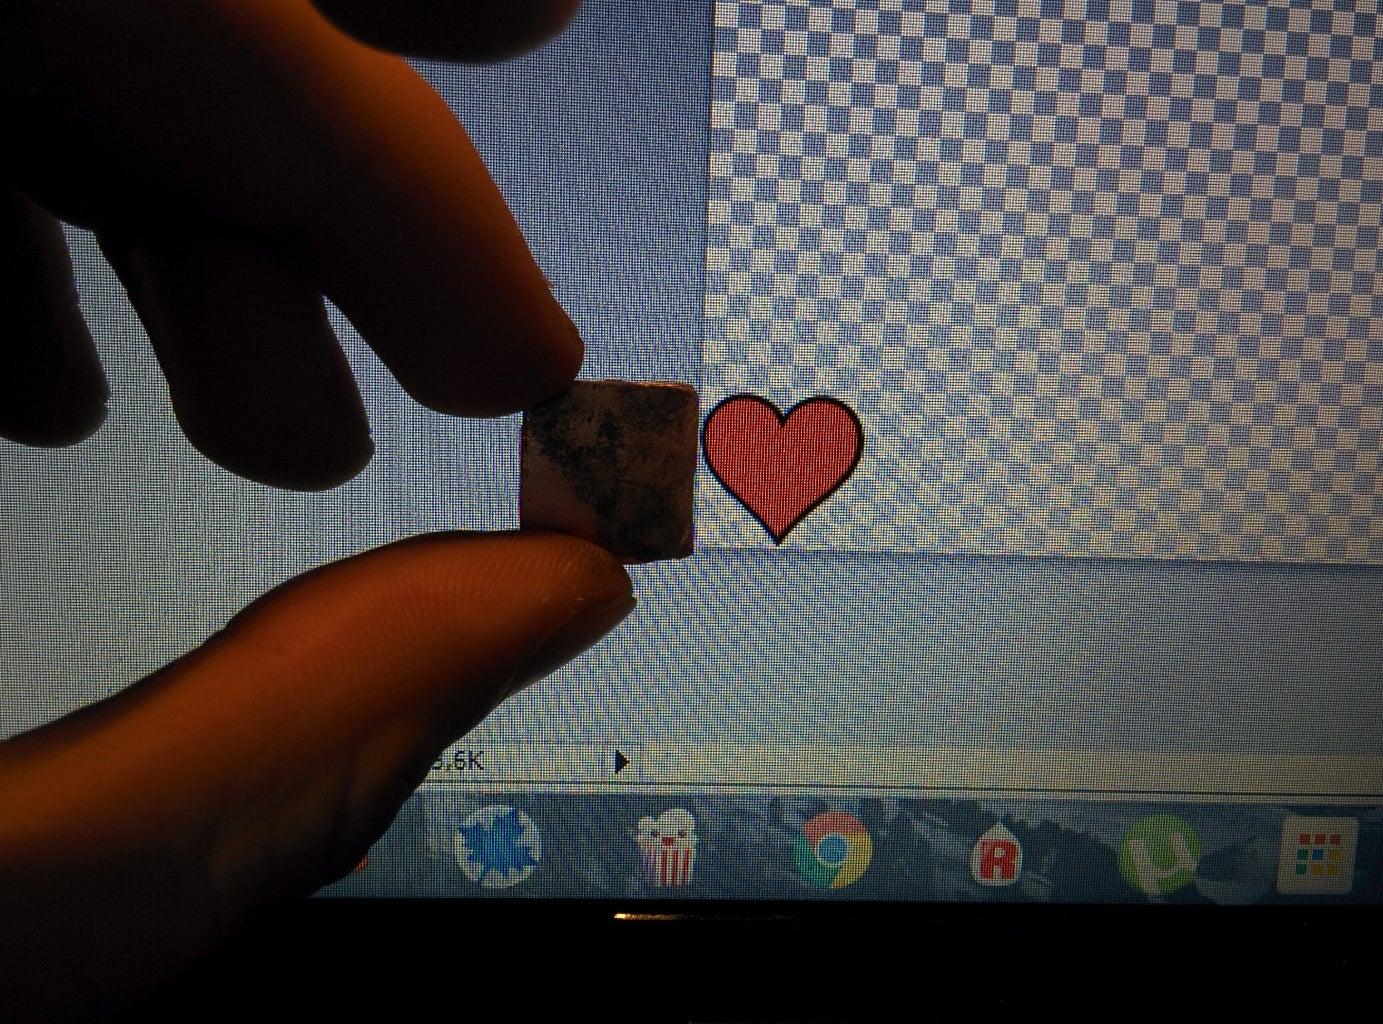 Shaping the Heart Pendant, Forging